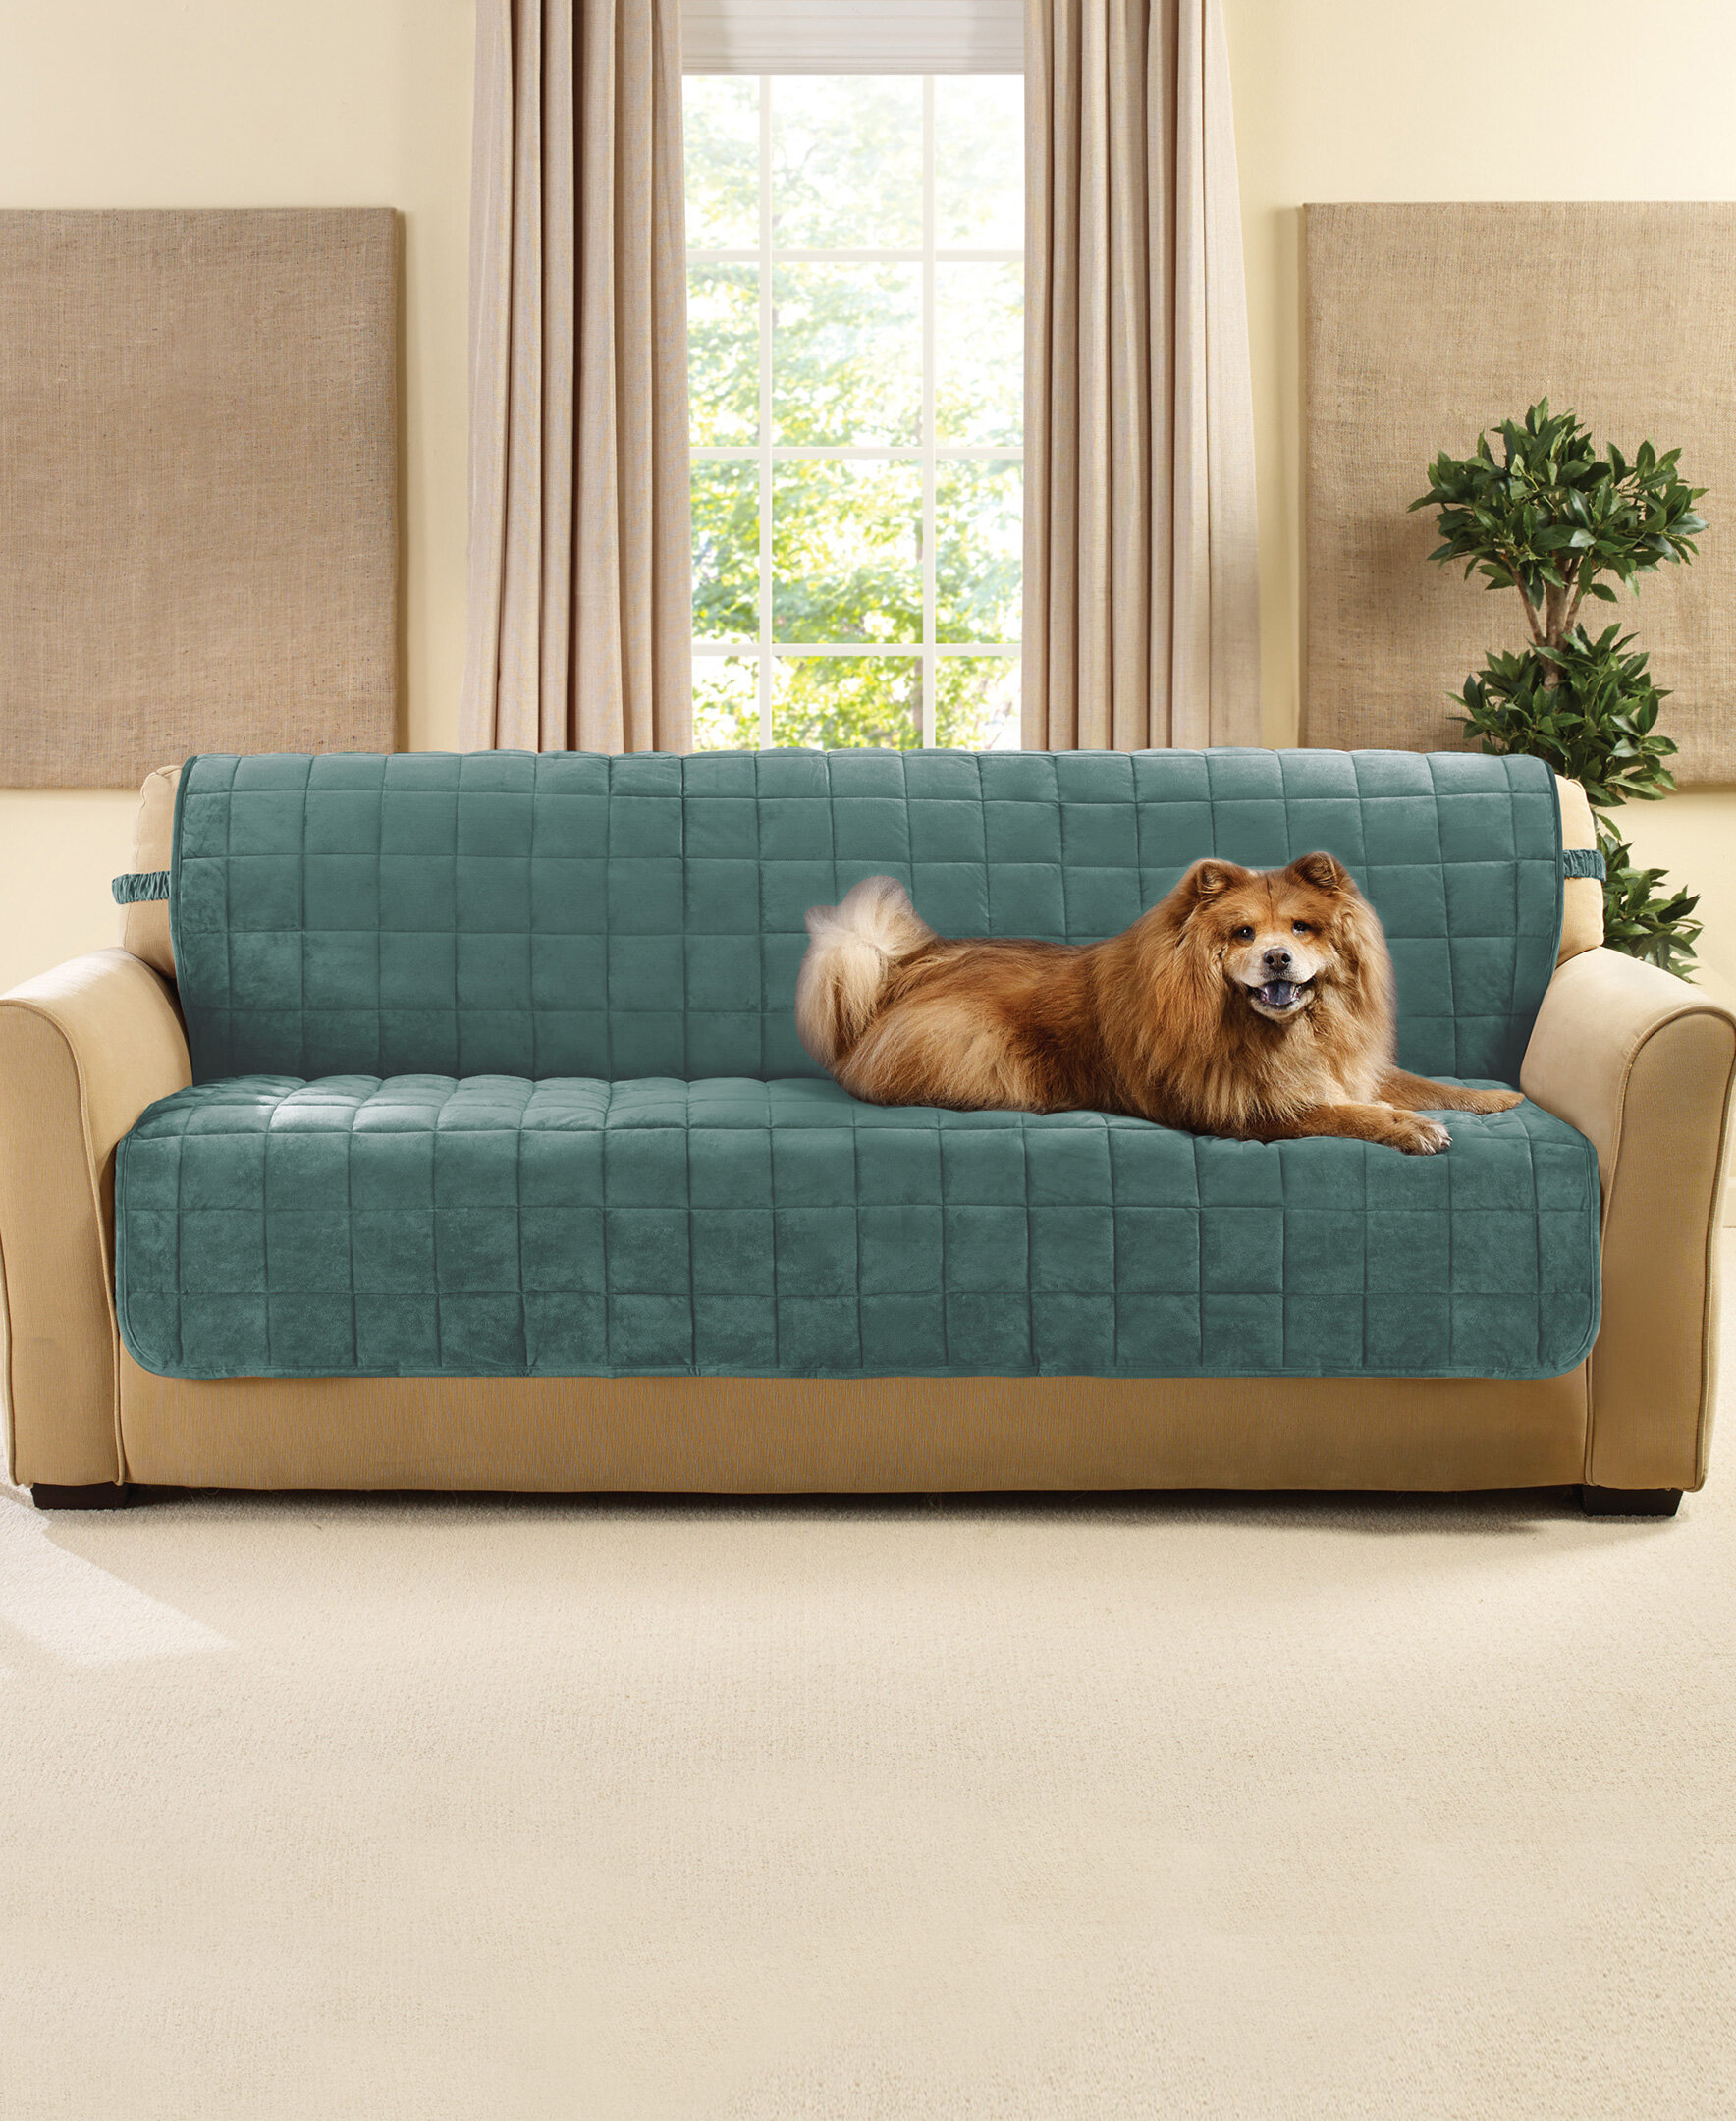 Sure Fit Deluxe Comfort Box Cushion Sofa Slipcover Wayfair